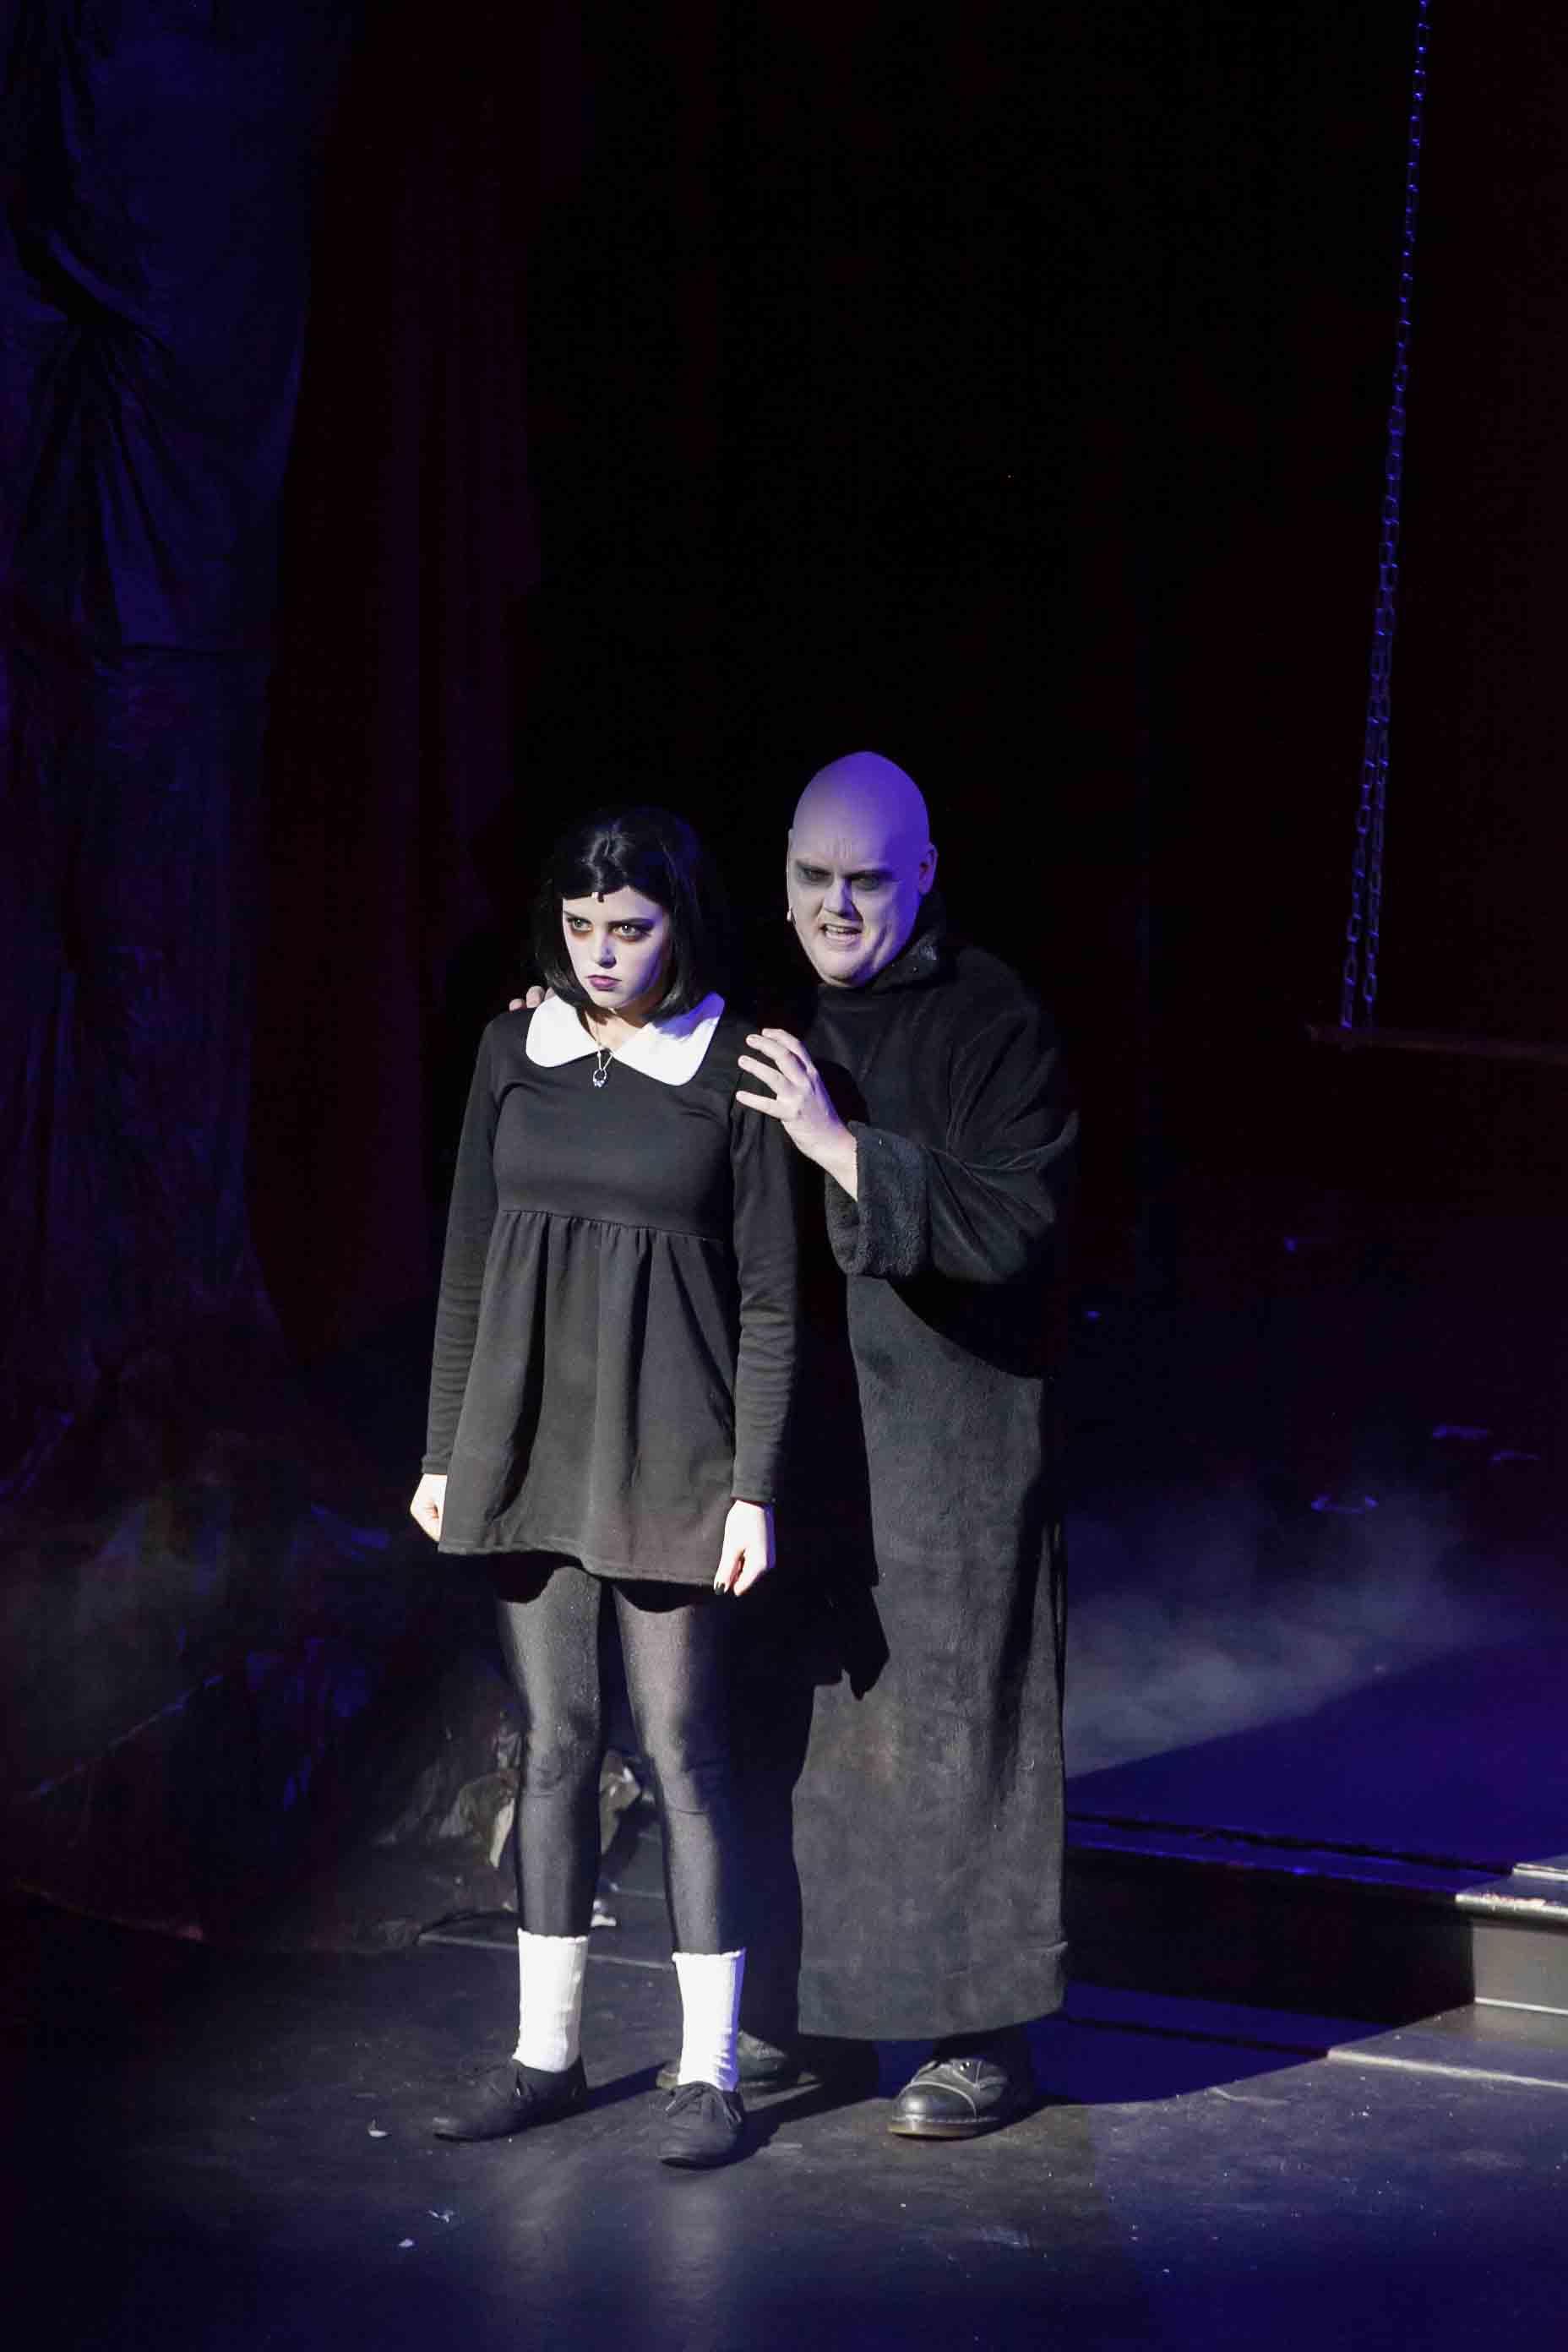 6-19-16 Addams Family Kooky Cast 0052.jpg